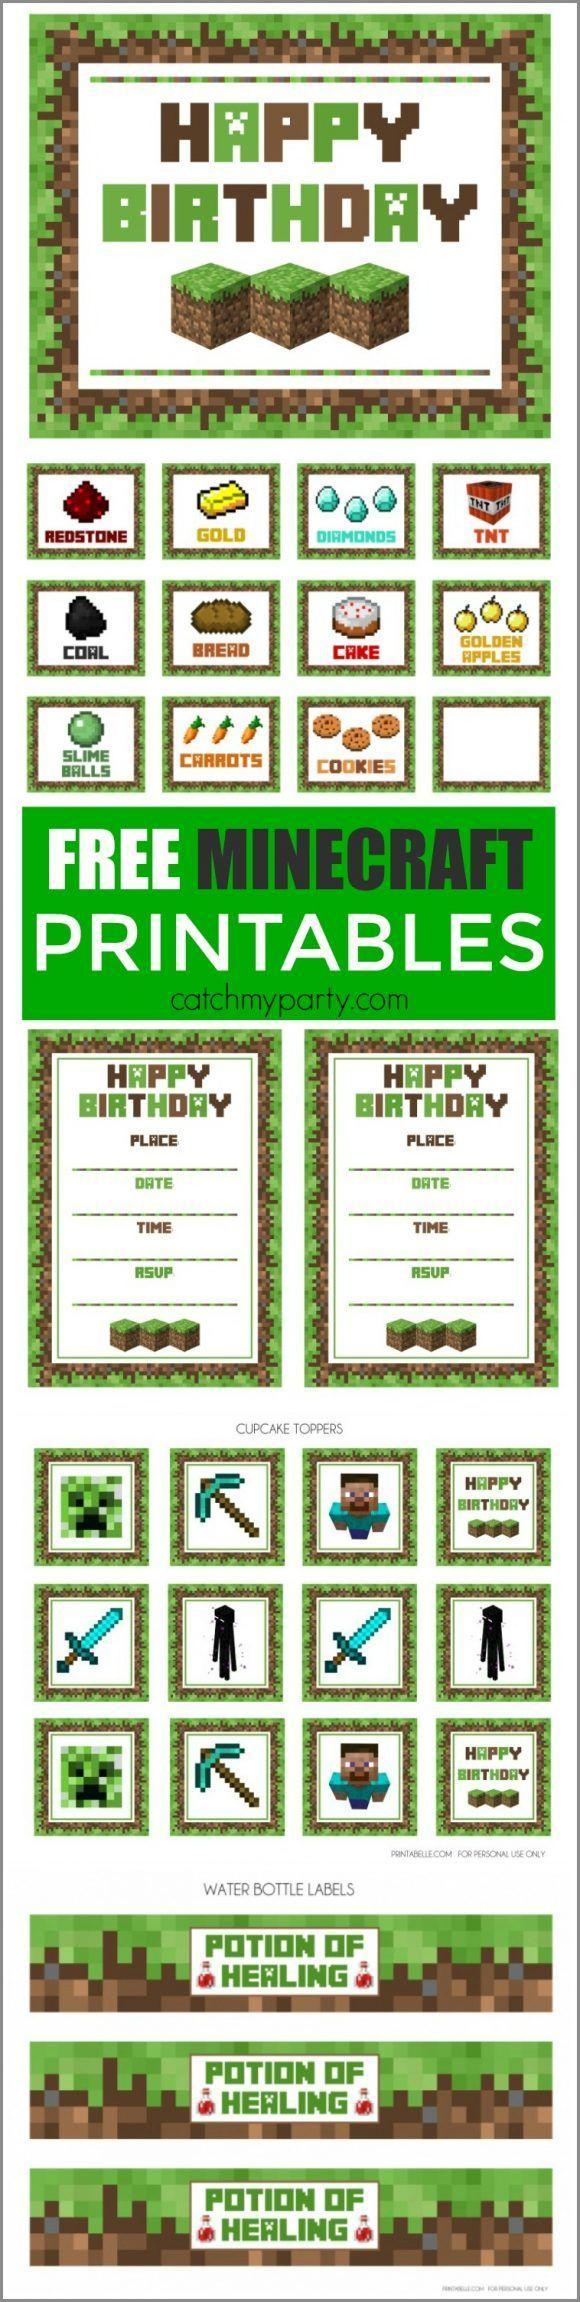 58 Best Minecraft Images On Pinterest Birthday Celebrations